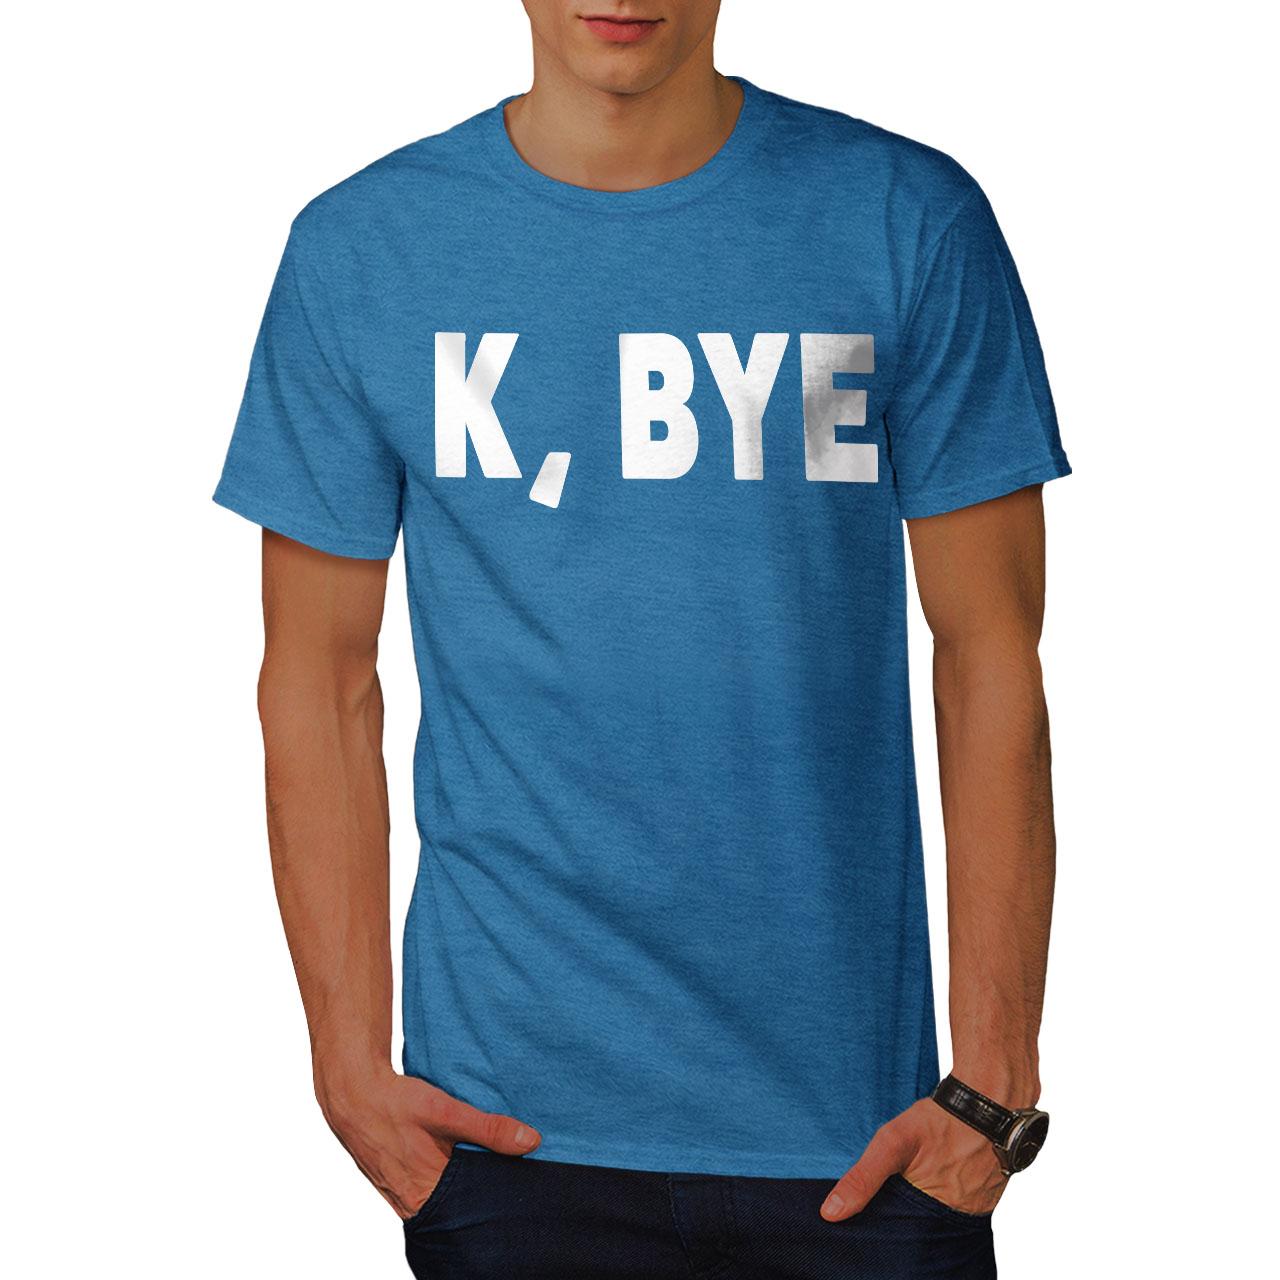 Wellcoda-K-Bye-See-You-Mens-T-shirt-Language-Graphic-Design-Printed-Tee